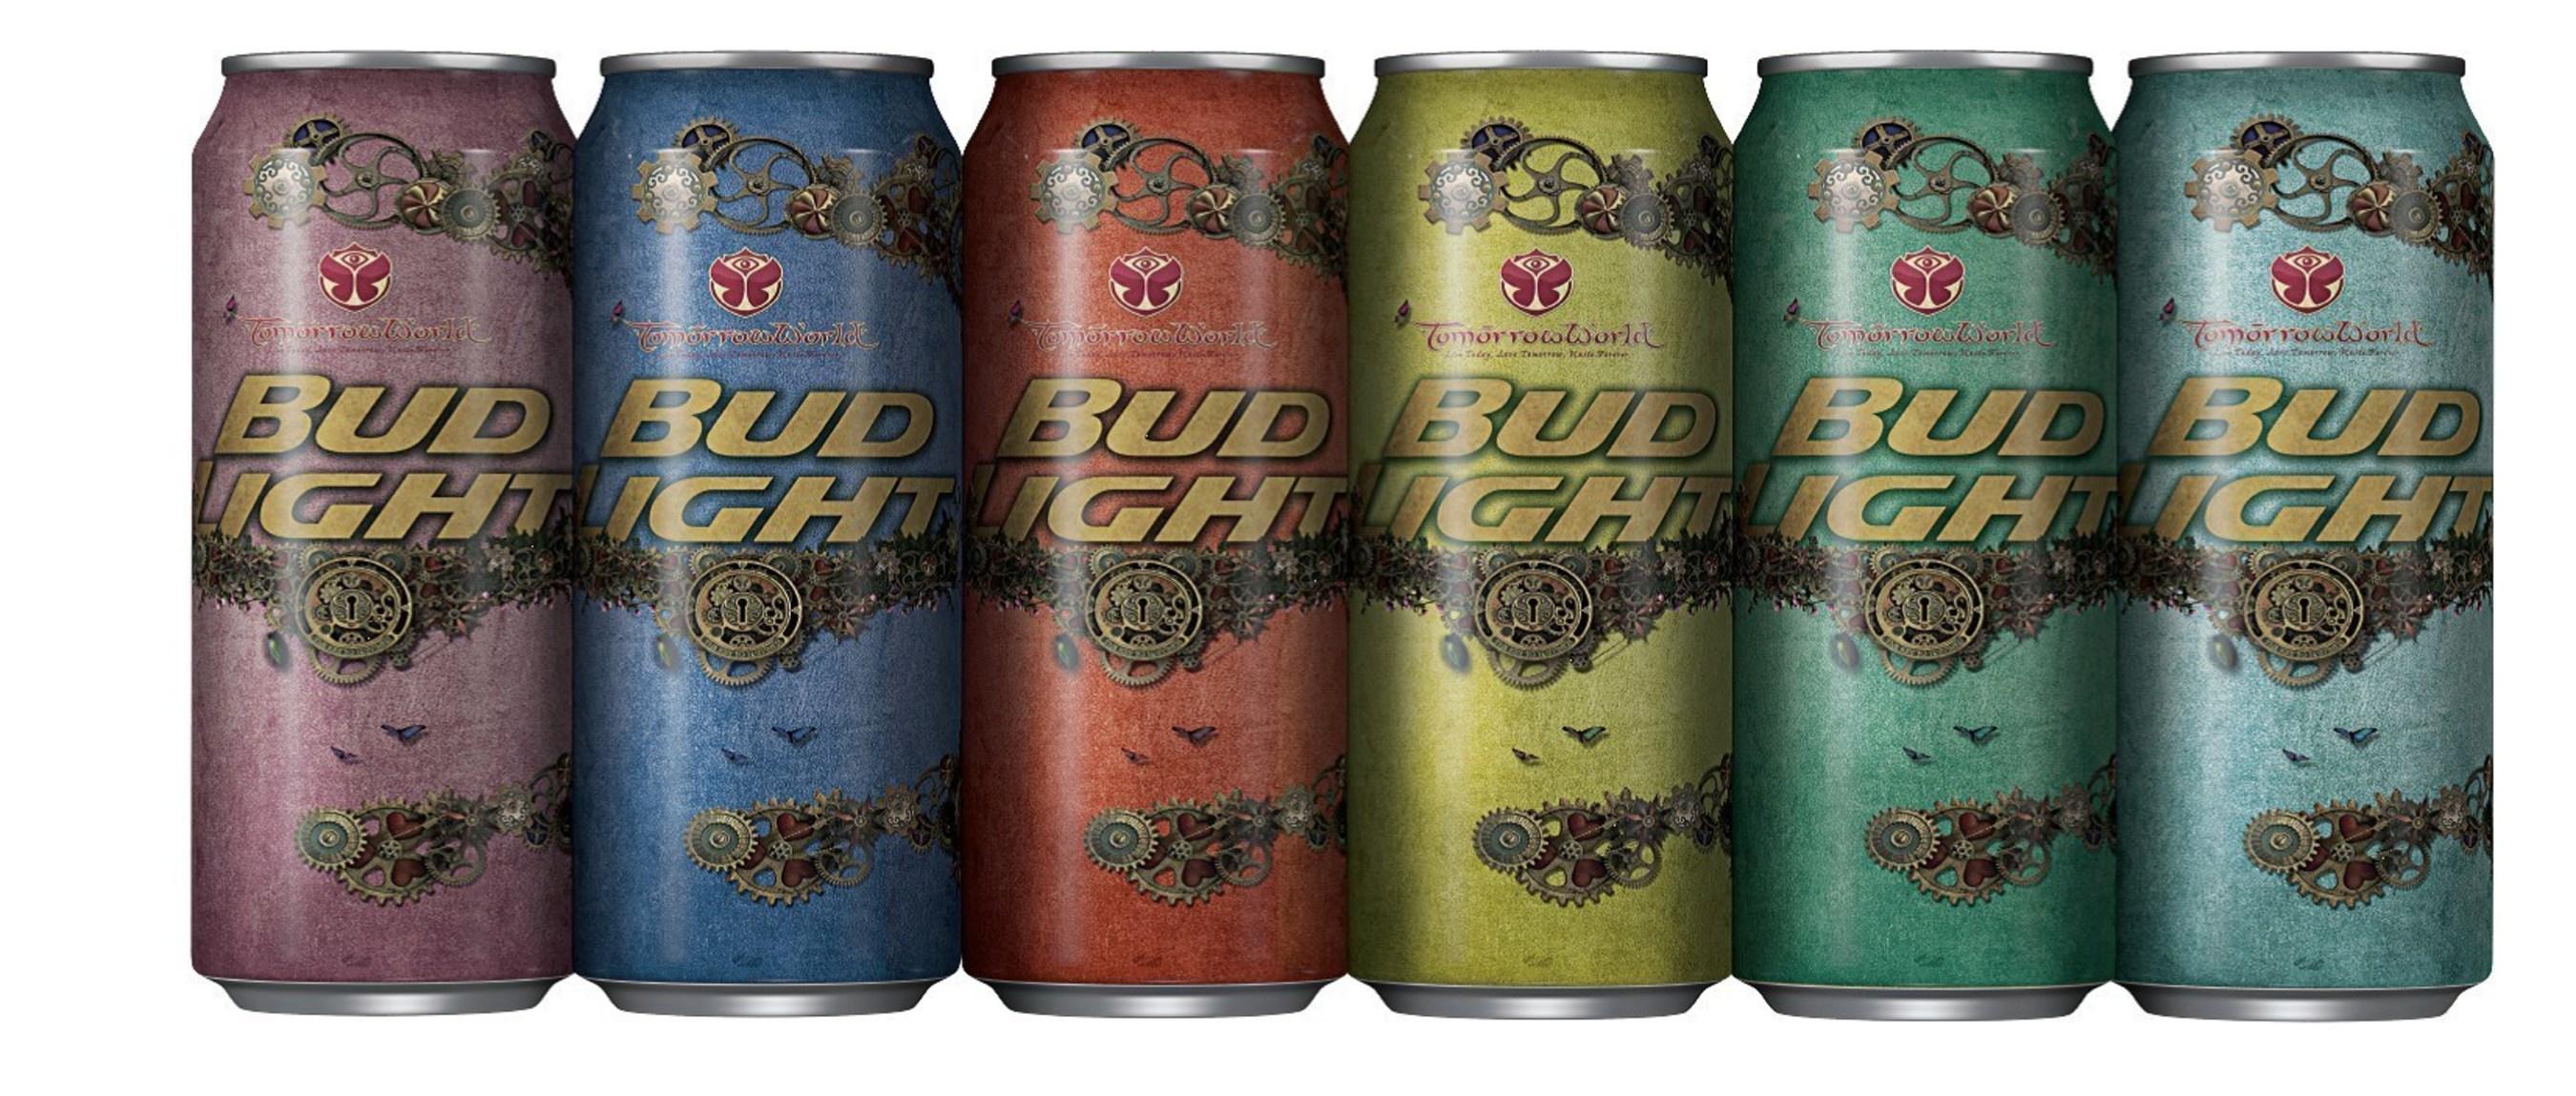 Bud Light Announces New TomorrowWorld Partnership, Limited Edition Festival Cans